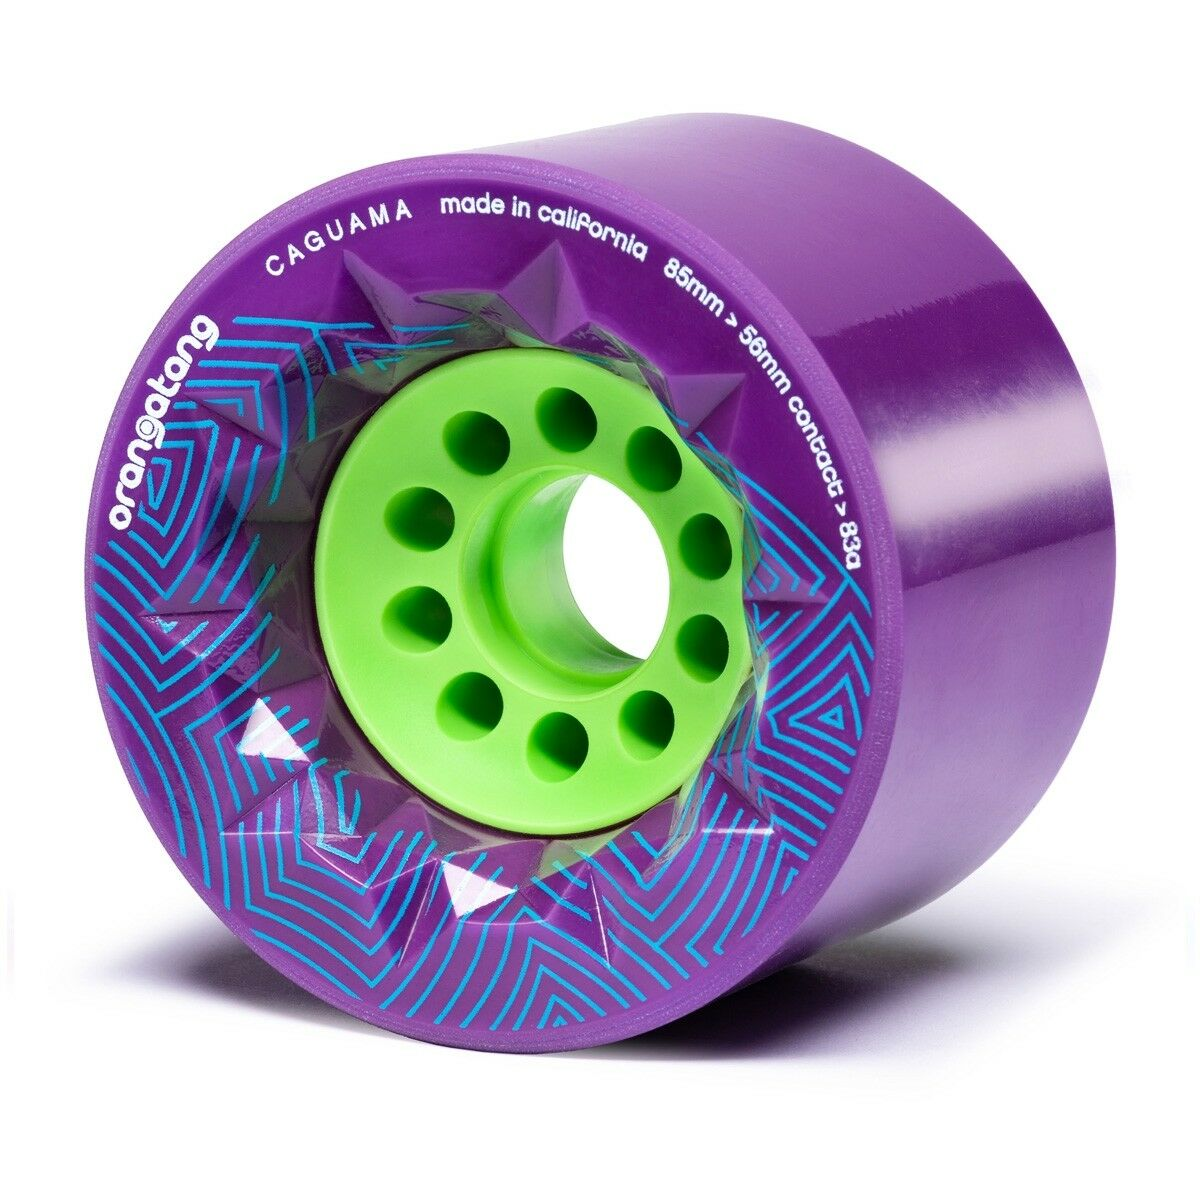 Orangatang Caguama Longboard Wheels - 85mm - Various Colours Available